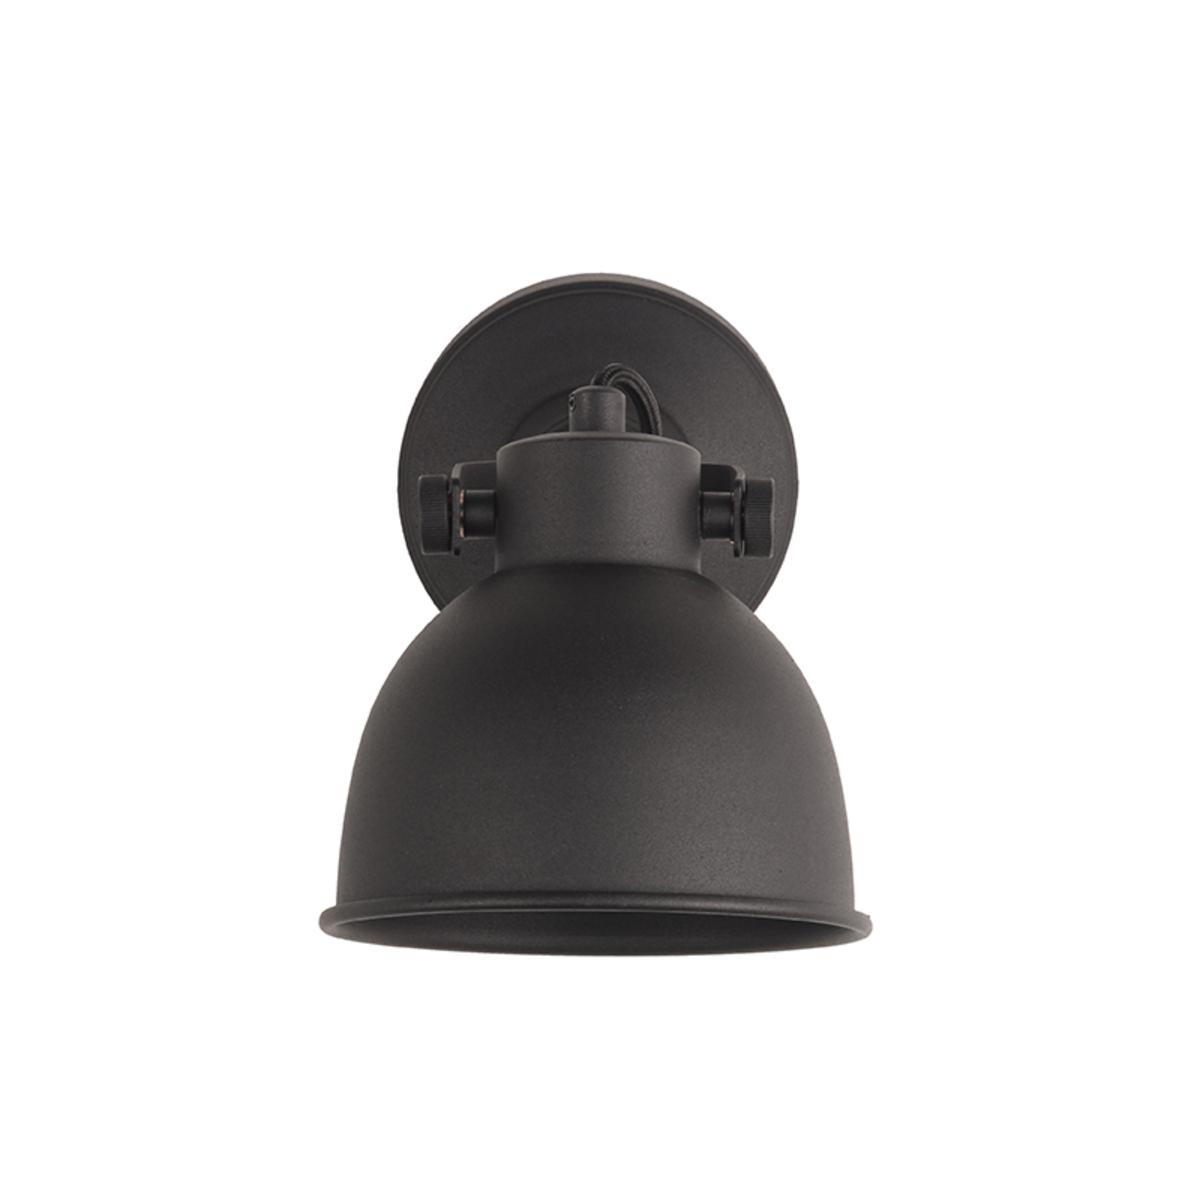 Wandlamp Bow - Zwart - Metaal - L